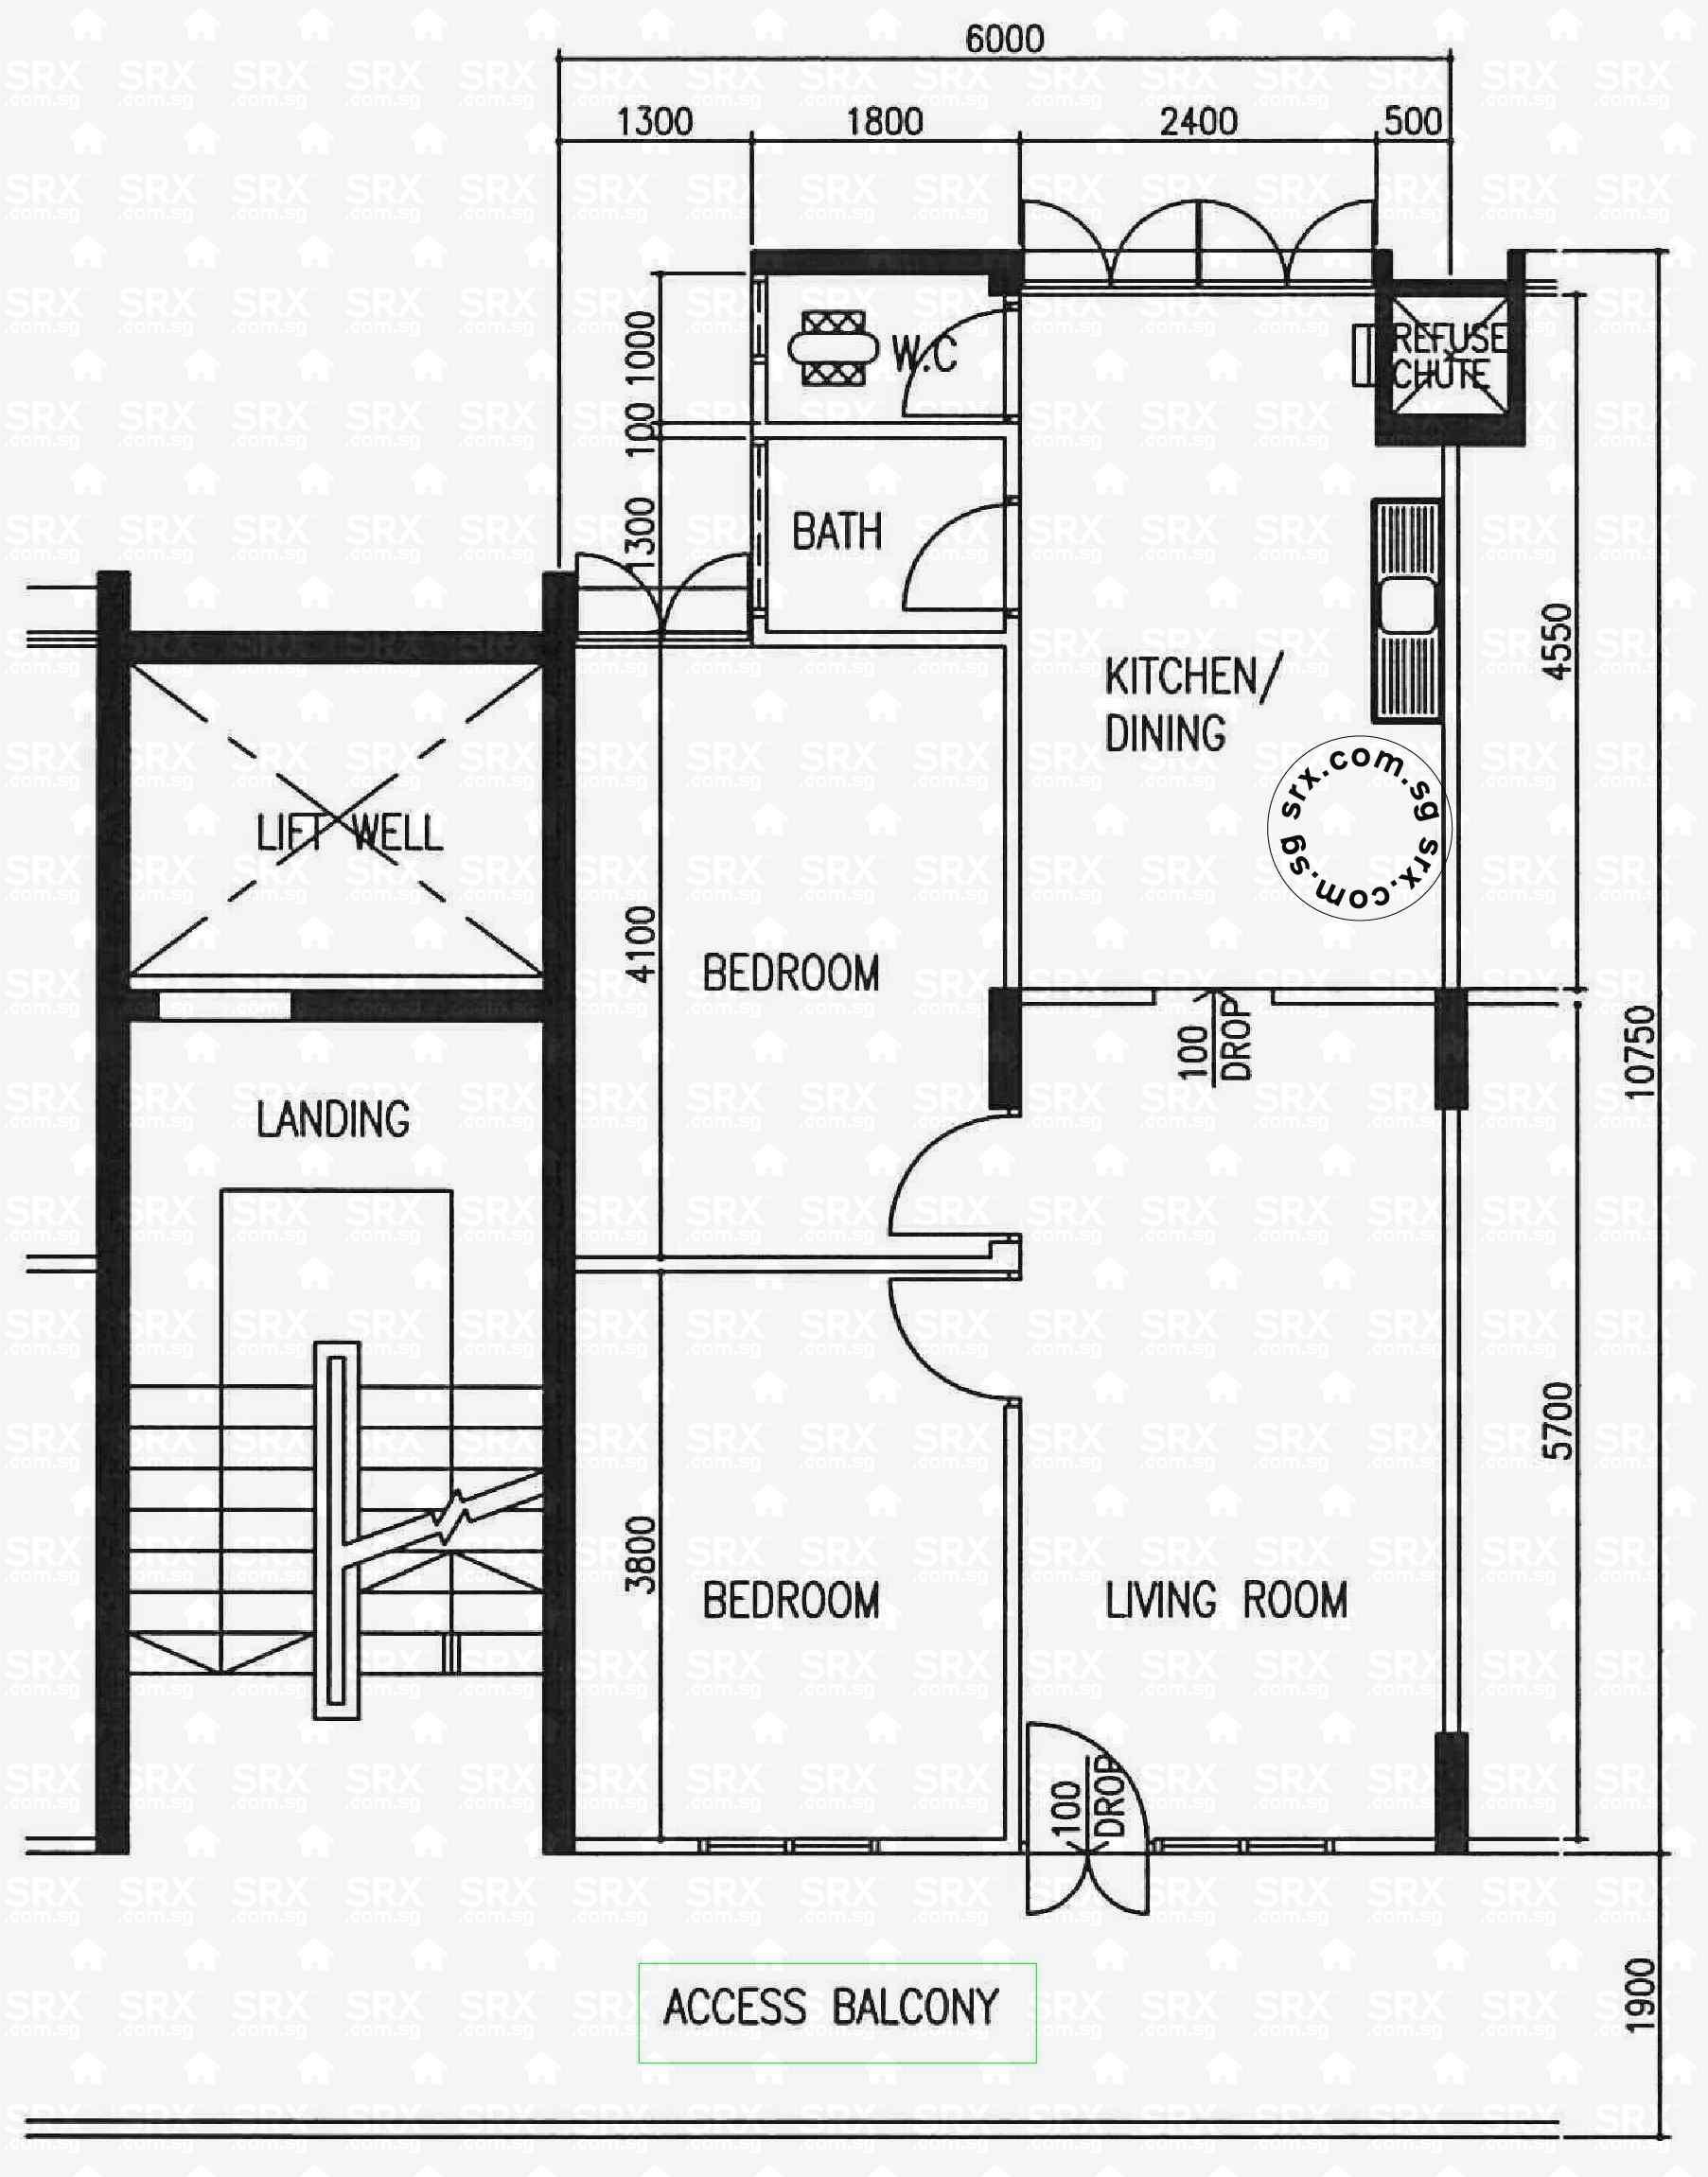 hougang street 51 hdb details srx property hougang avenue 4 hdb details srx property